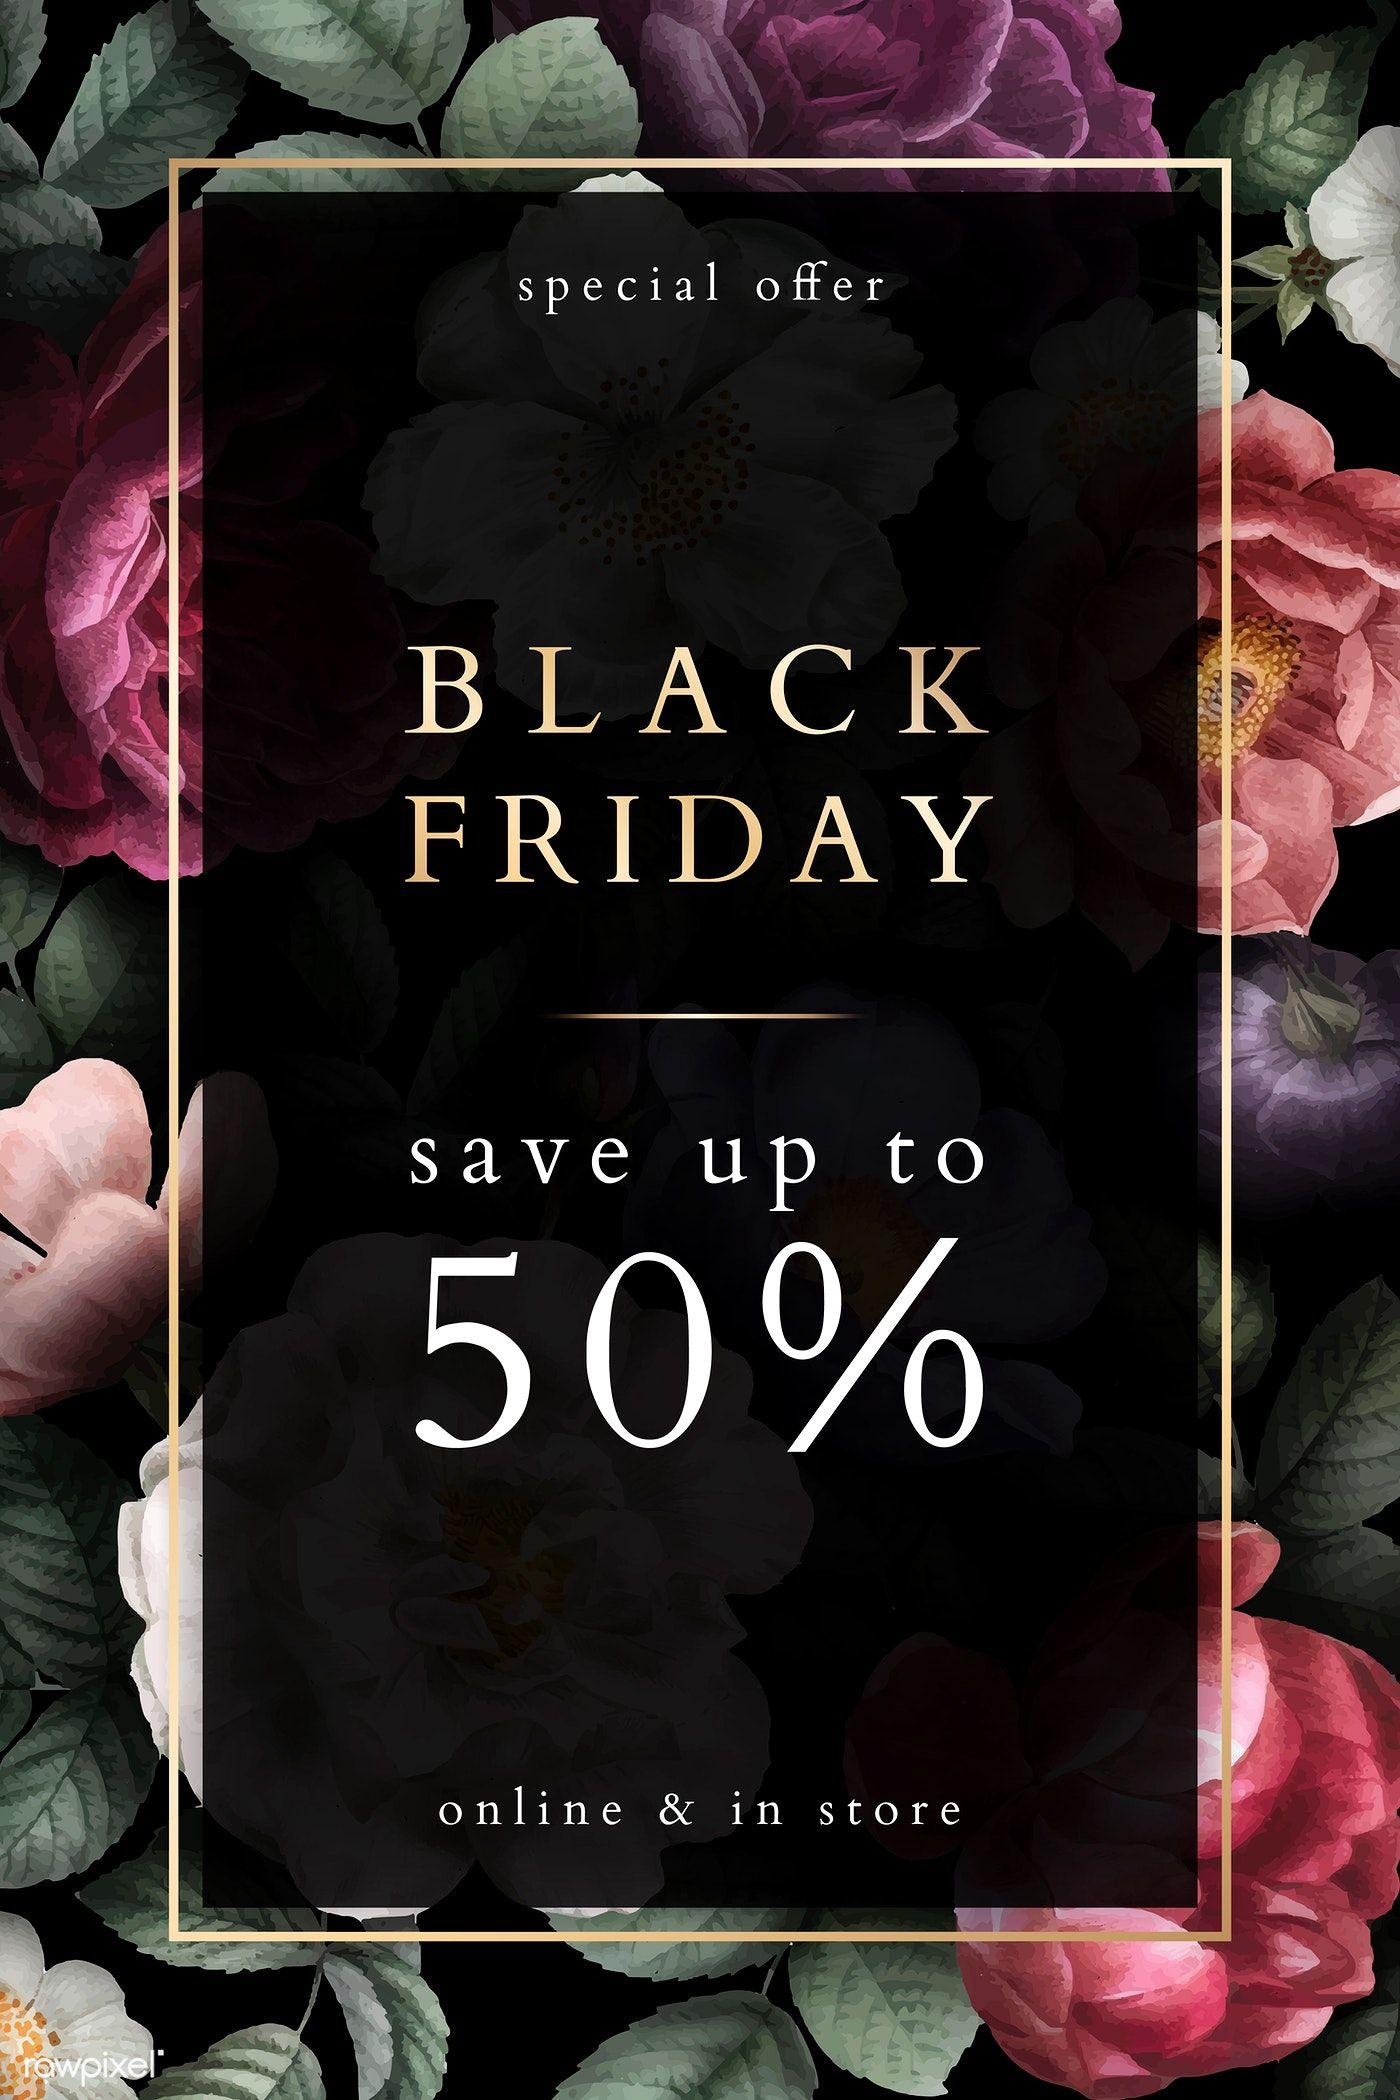 Download Premium Vector Of Black Friday Sign On A Floral Garden Background Black Friday Sign Black Friday Poster Black Friday Design